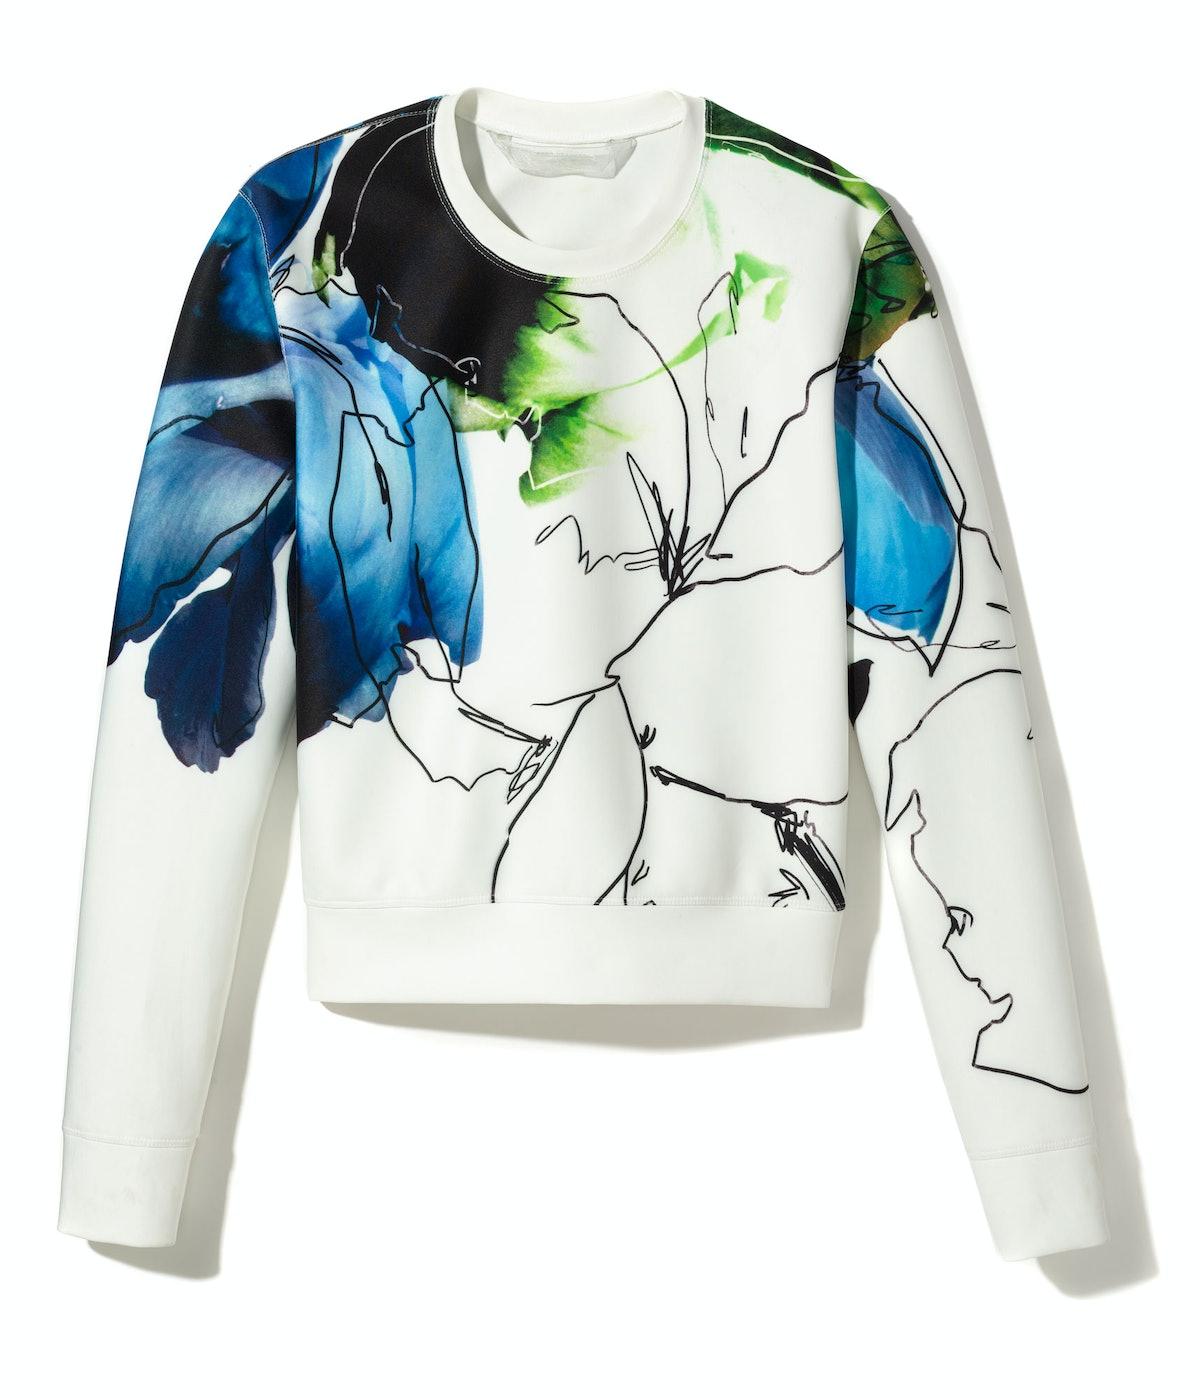 Reed Krakoff sweatshirt, $1,190, [reedkrakoff.com](http://www.reedkrakoff.com/online/handbags/USIndexView?storeId=16001&catalogId=16500&langId=-1).